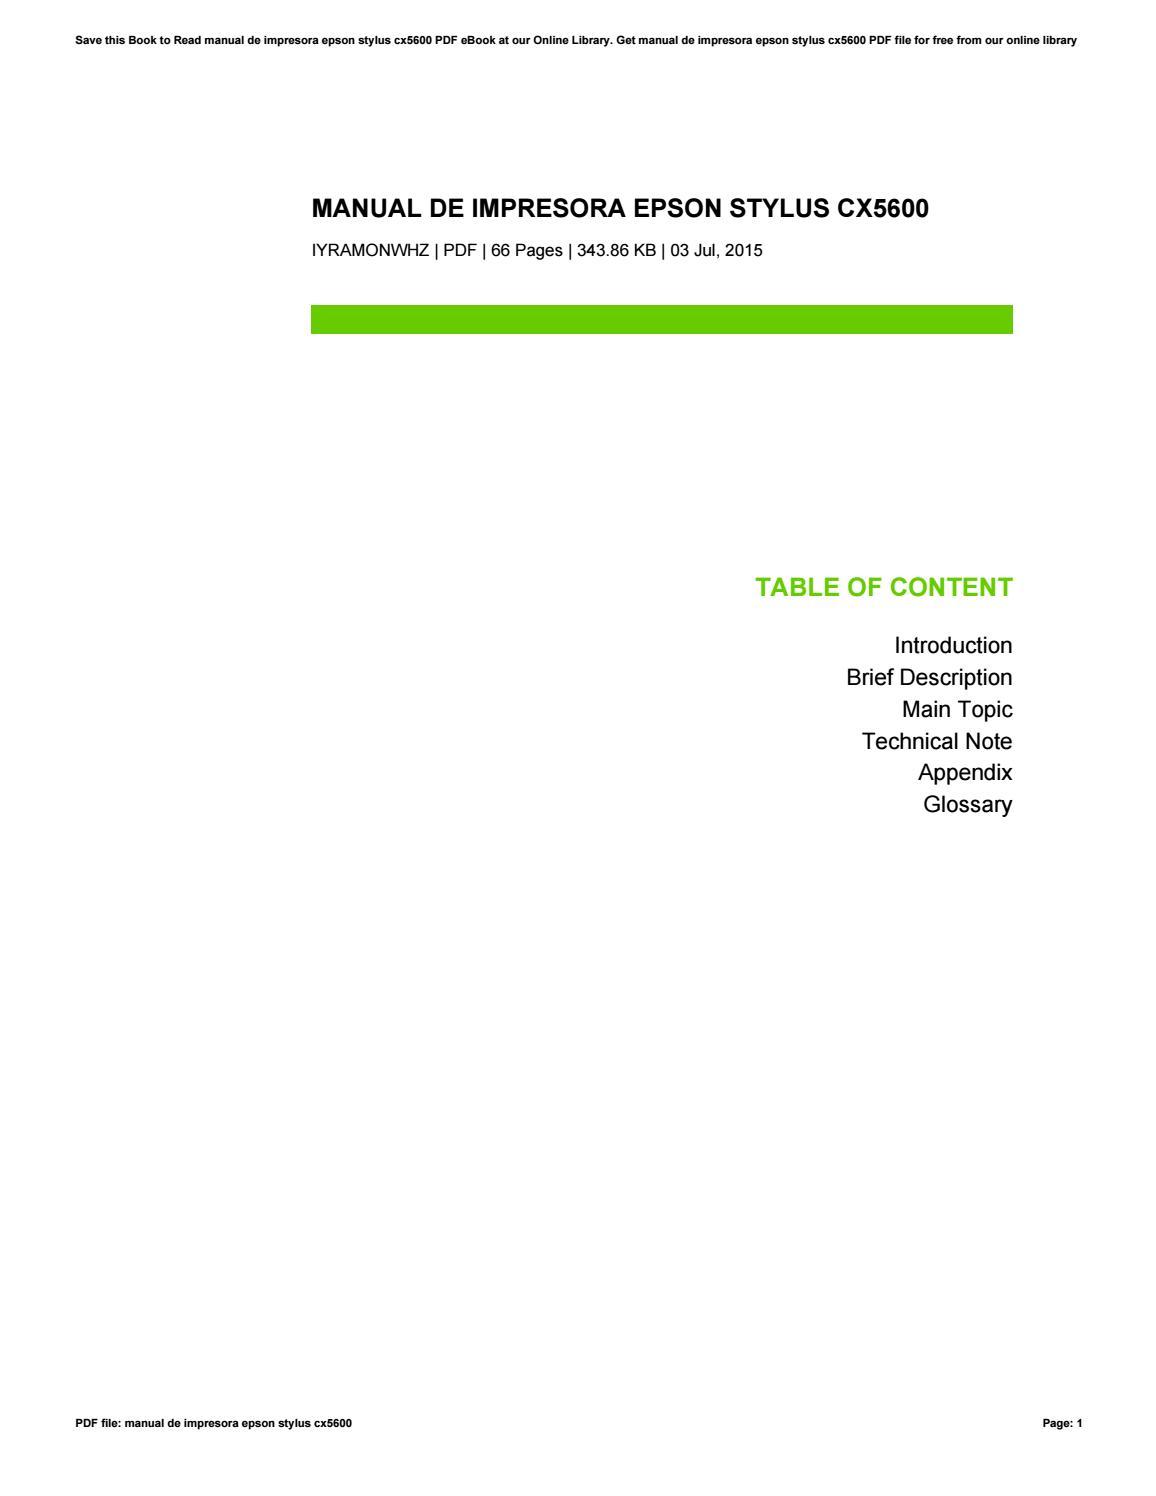 manual de impresora epson stylus cx5600 by yvonnechavez3948 issuu rh issuu com Epson NX215 Printer Manual Epson Printer R 2400 Manuals